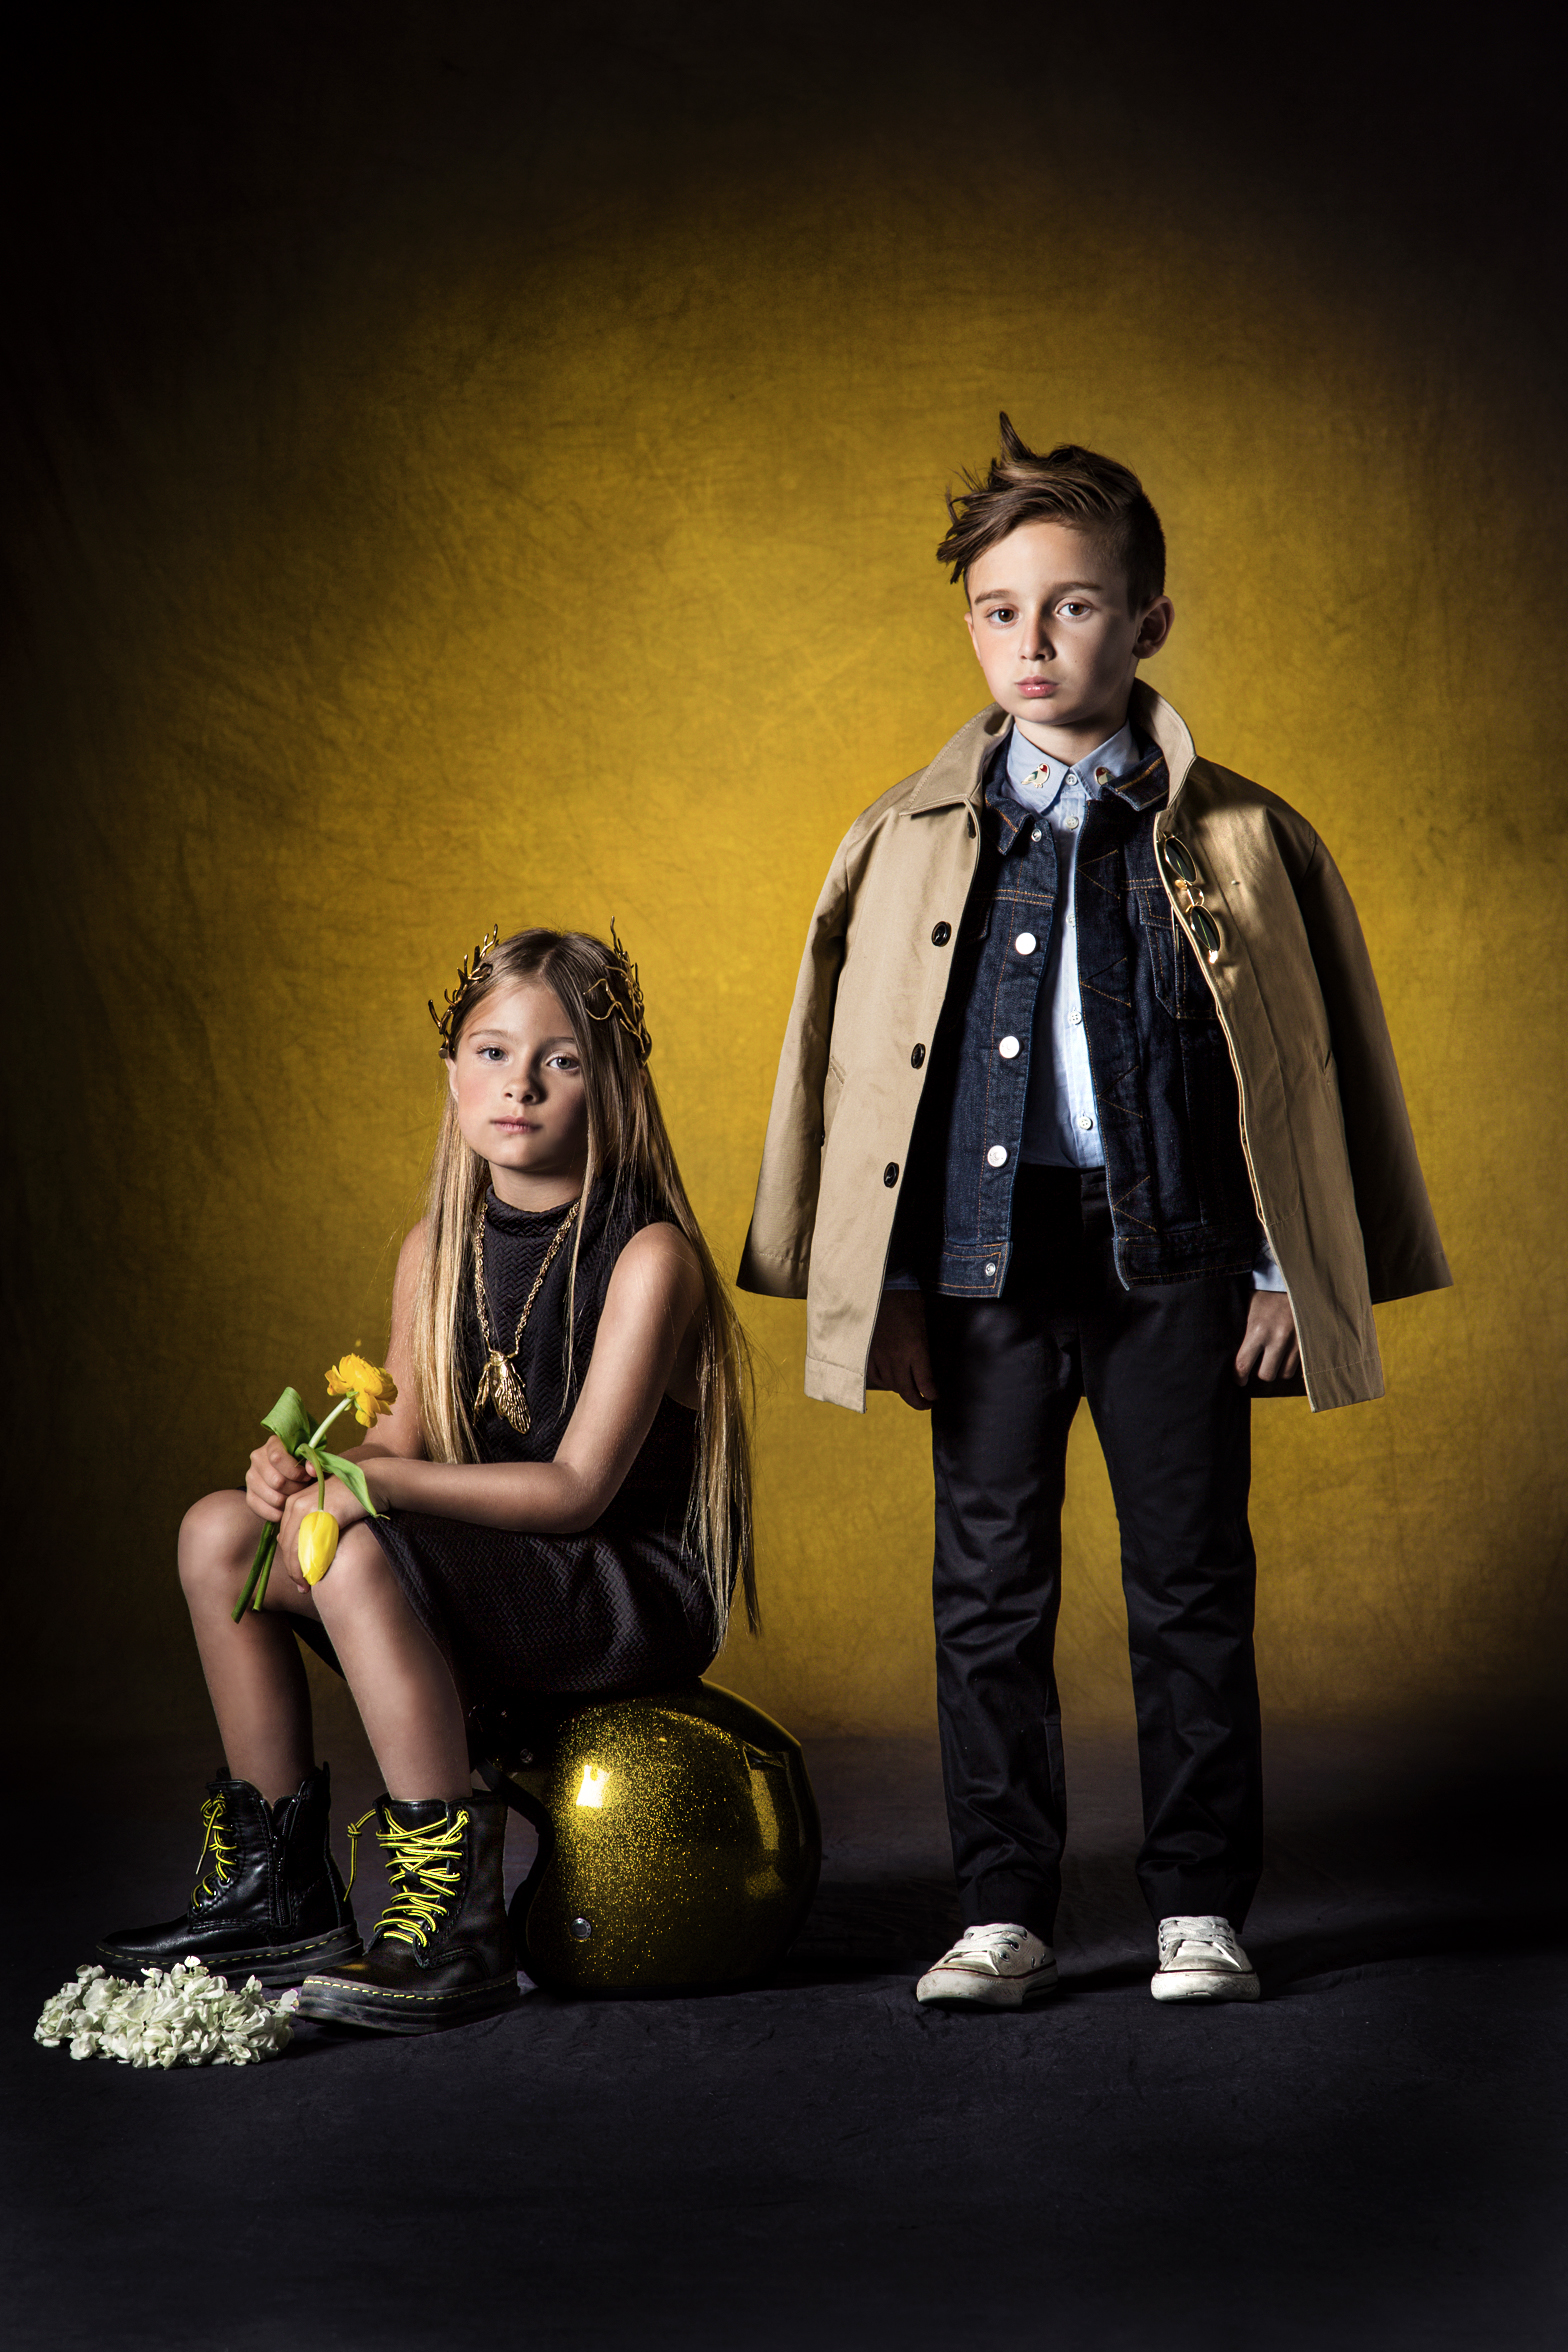 alonso_mateo_kids_fashion_felicidad_de_lucas_photographer_001.jpg